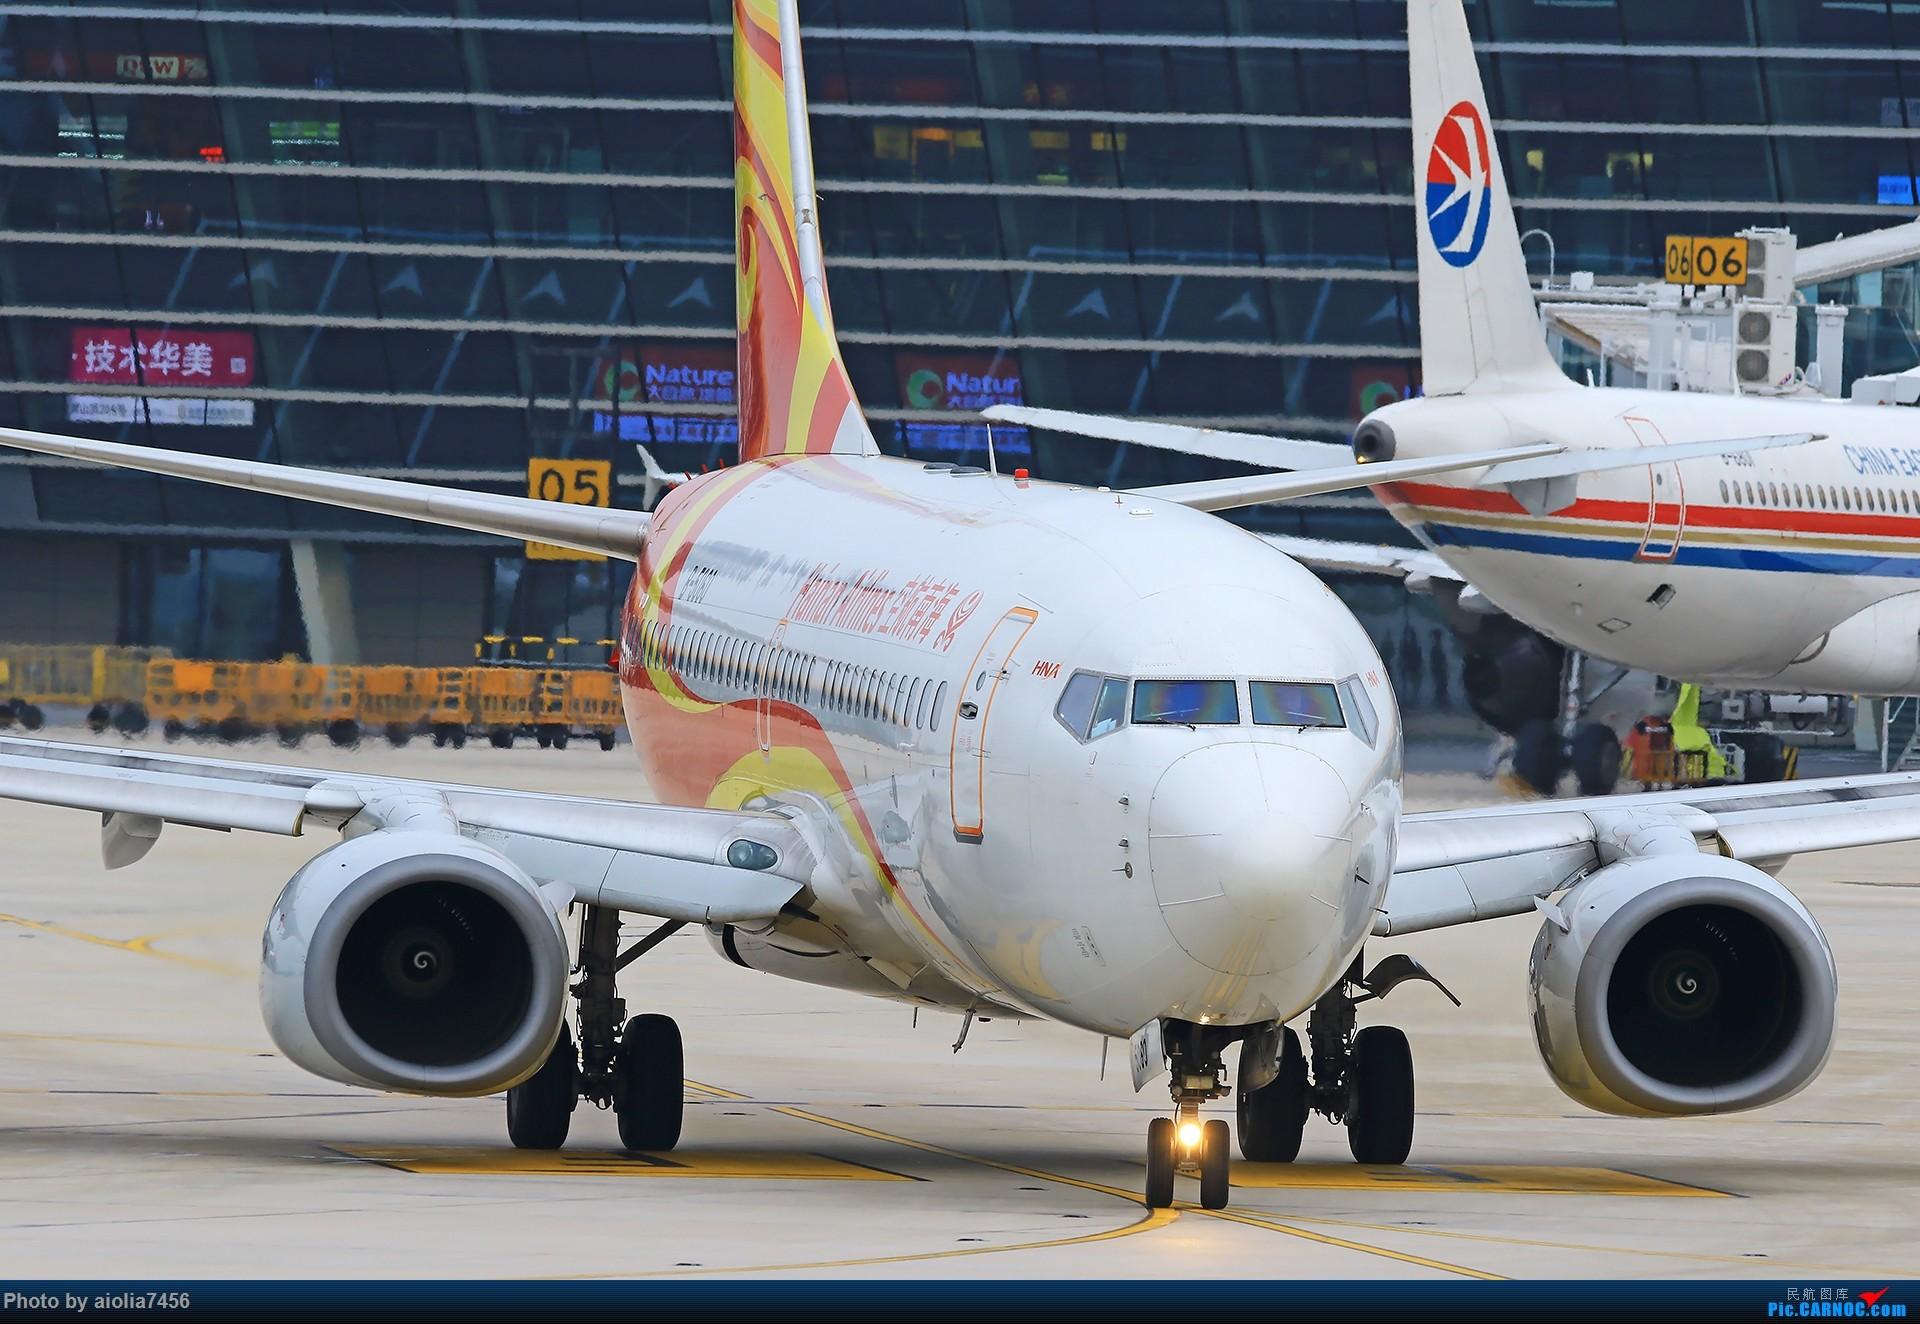 Re:[原创][合肥飞友会]霸都打鸡 找个机会白天打华航 顺便看看期待已久的迪斯尼 BOEING 737-700 B-5060 中国合肥新桥国际机场